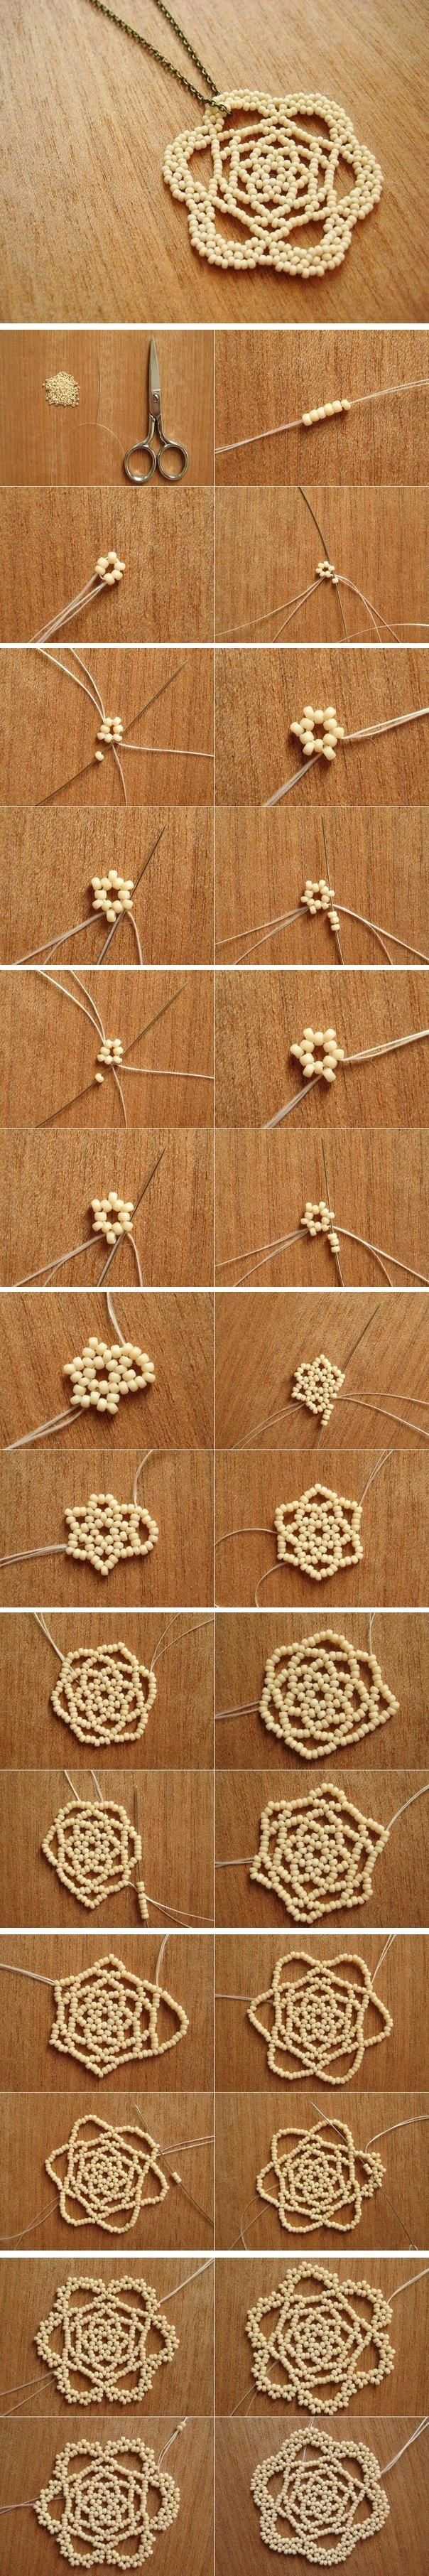 DIY Bead Necklace beads crafts diy diy bracelet diy jewelry craft bracelet crafty easy diy easy crafts craft ideas diy ideas jewelry diy